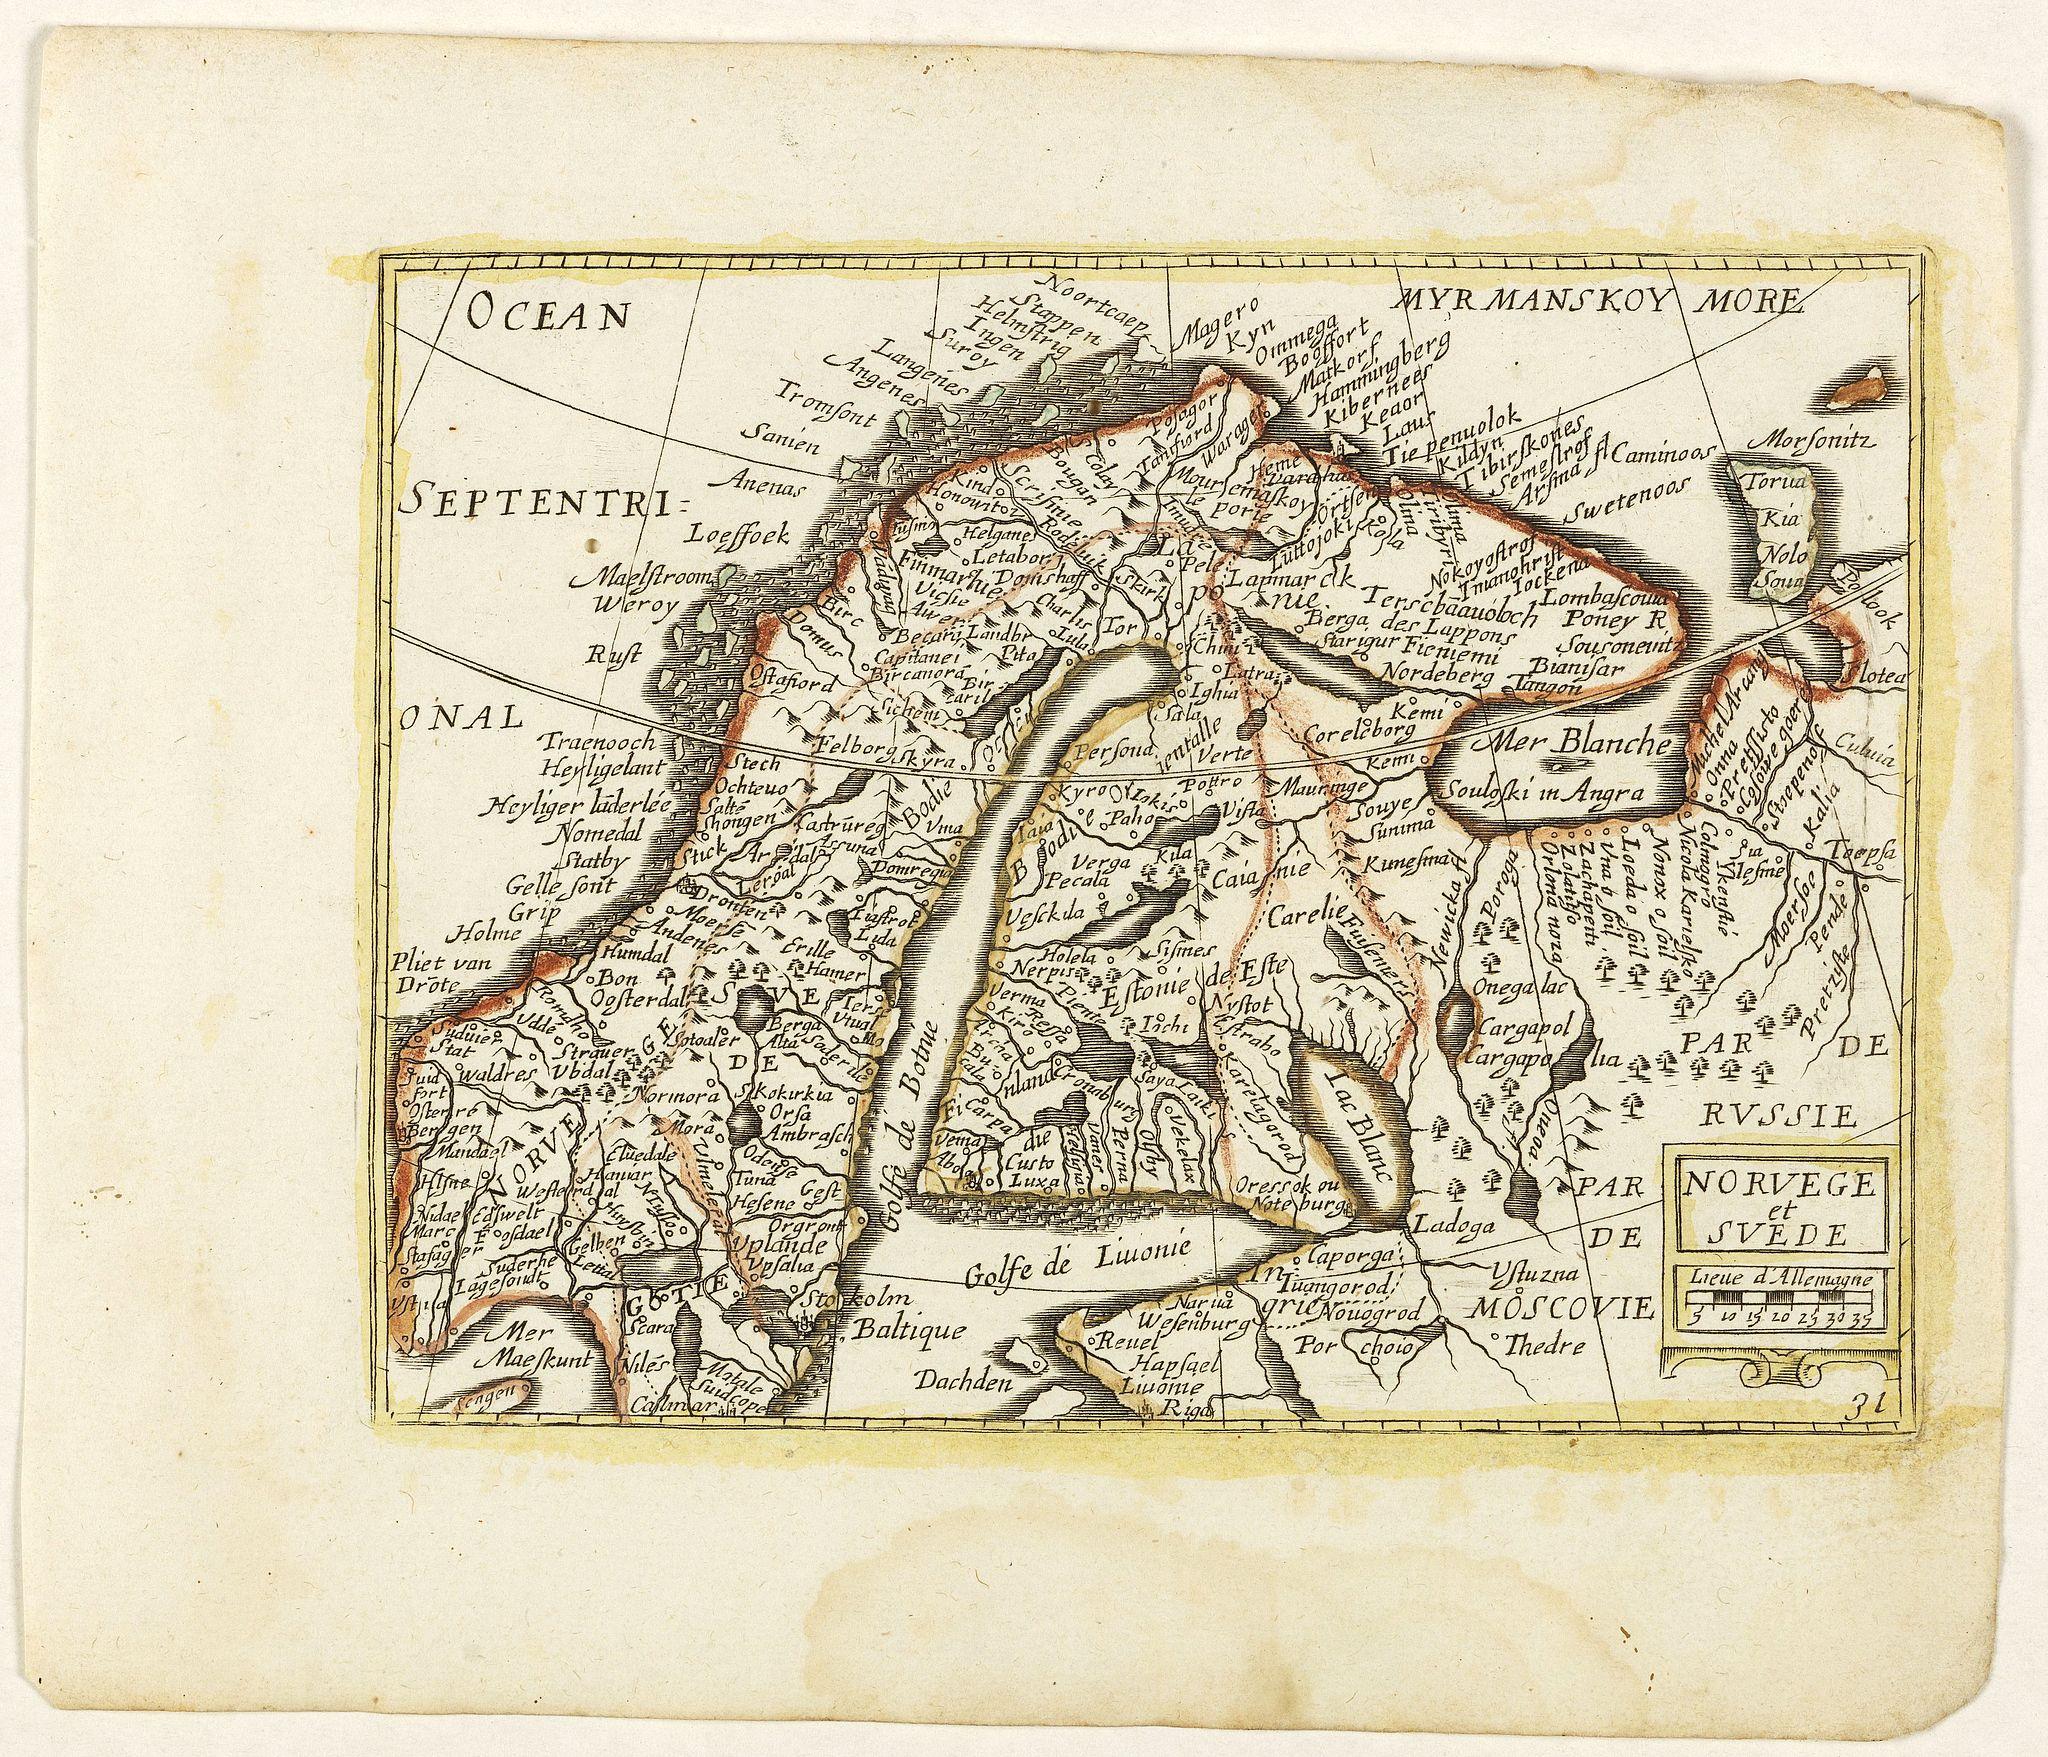 PICART, Nicolas / DUVAL, Pierre. -  Norvege et Suede. (31).